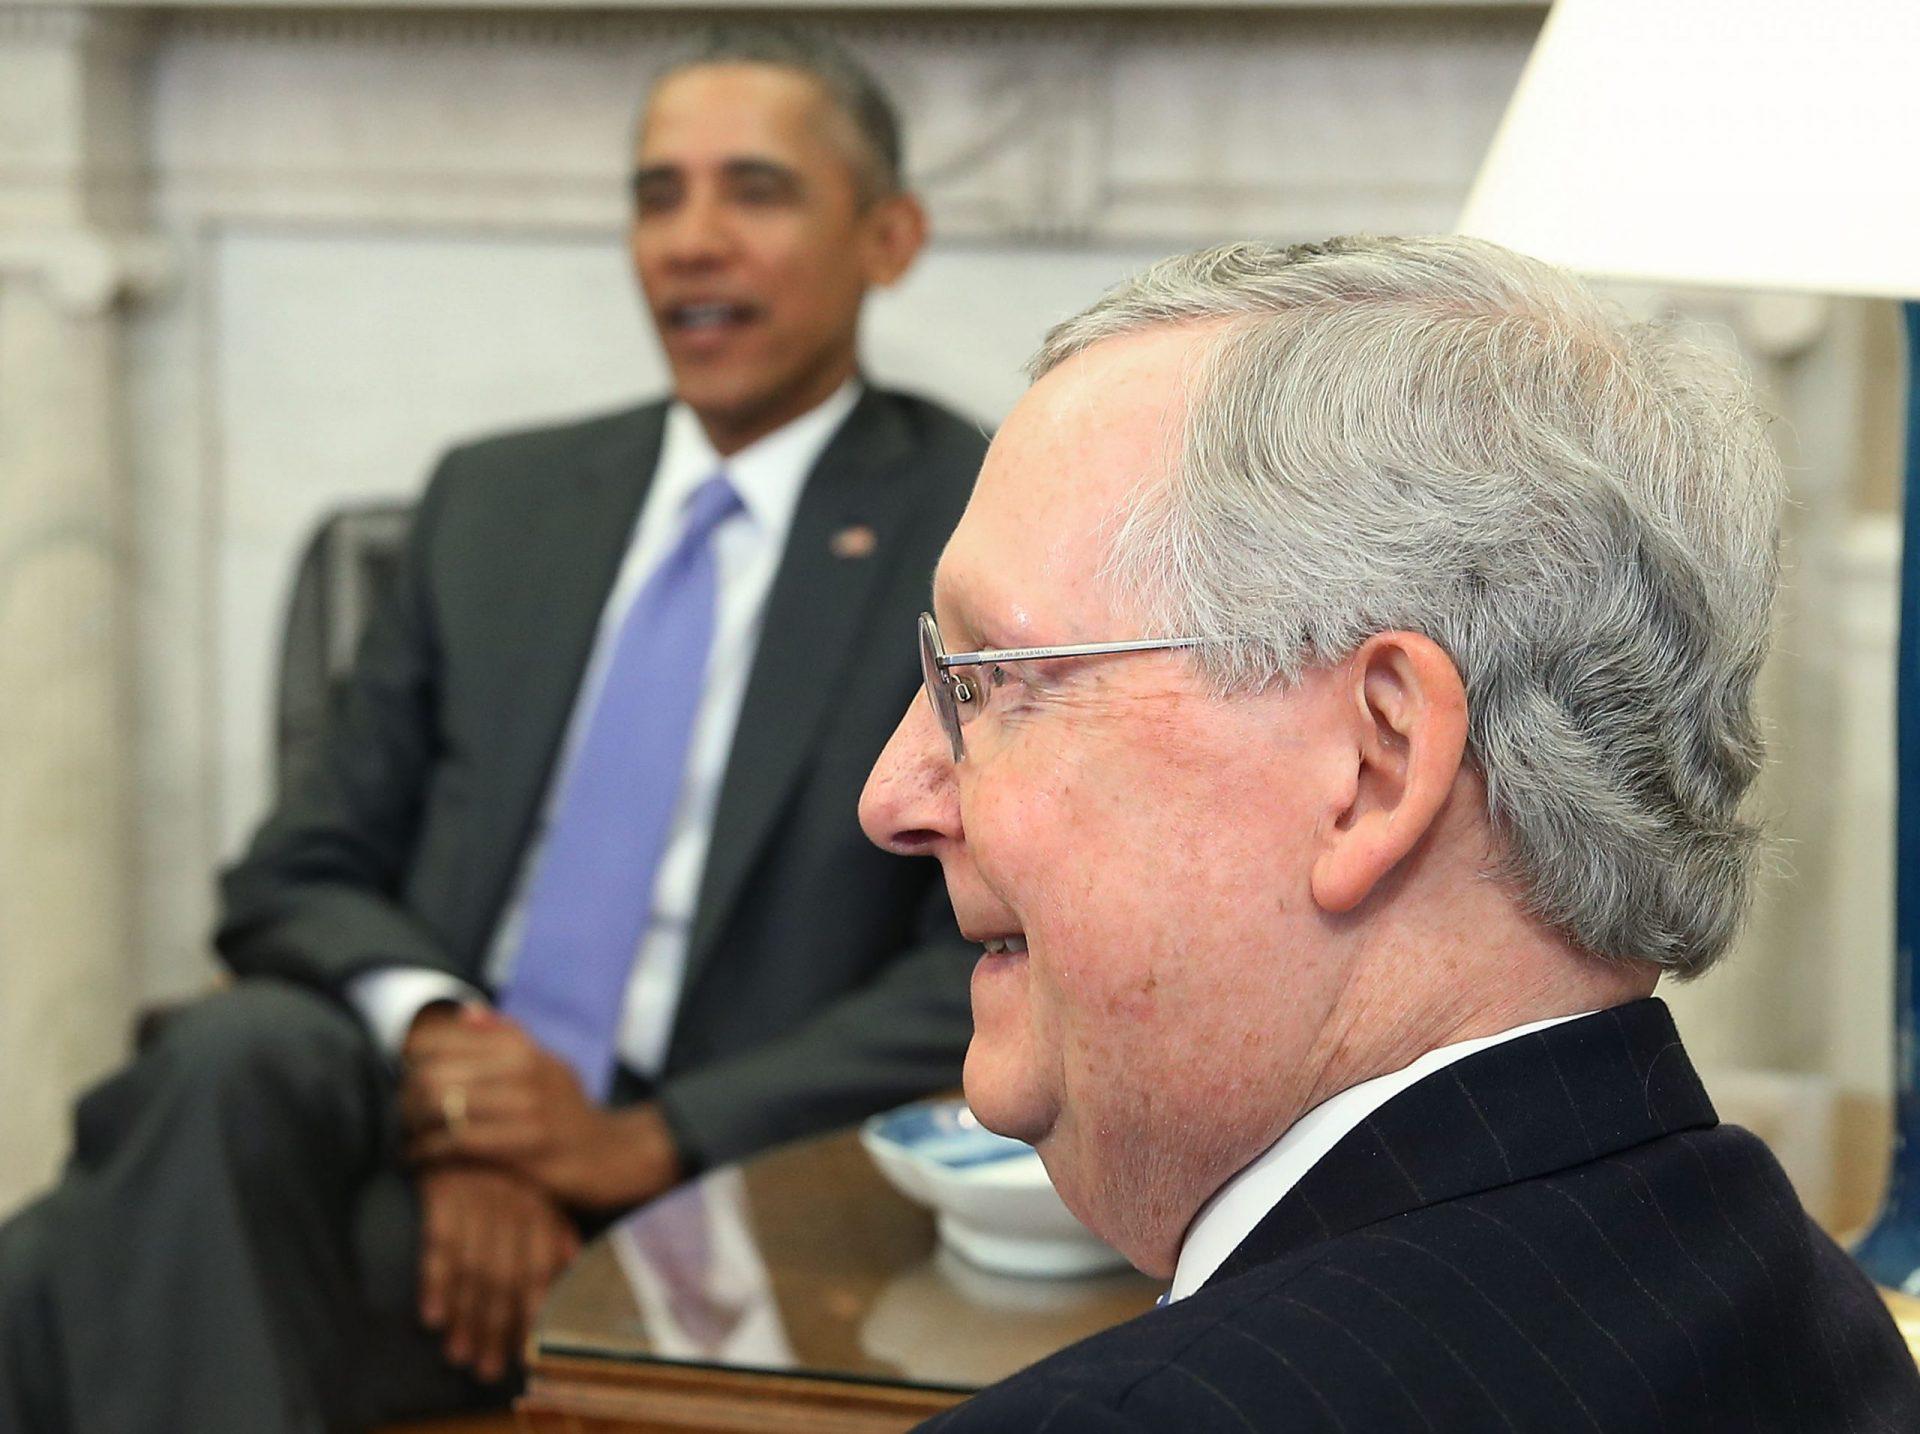 Barack Obama Mitch McConnell theGrio.com